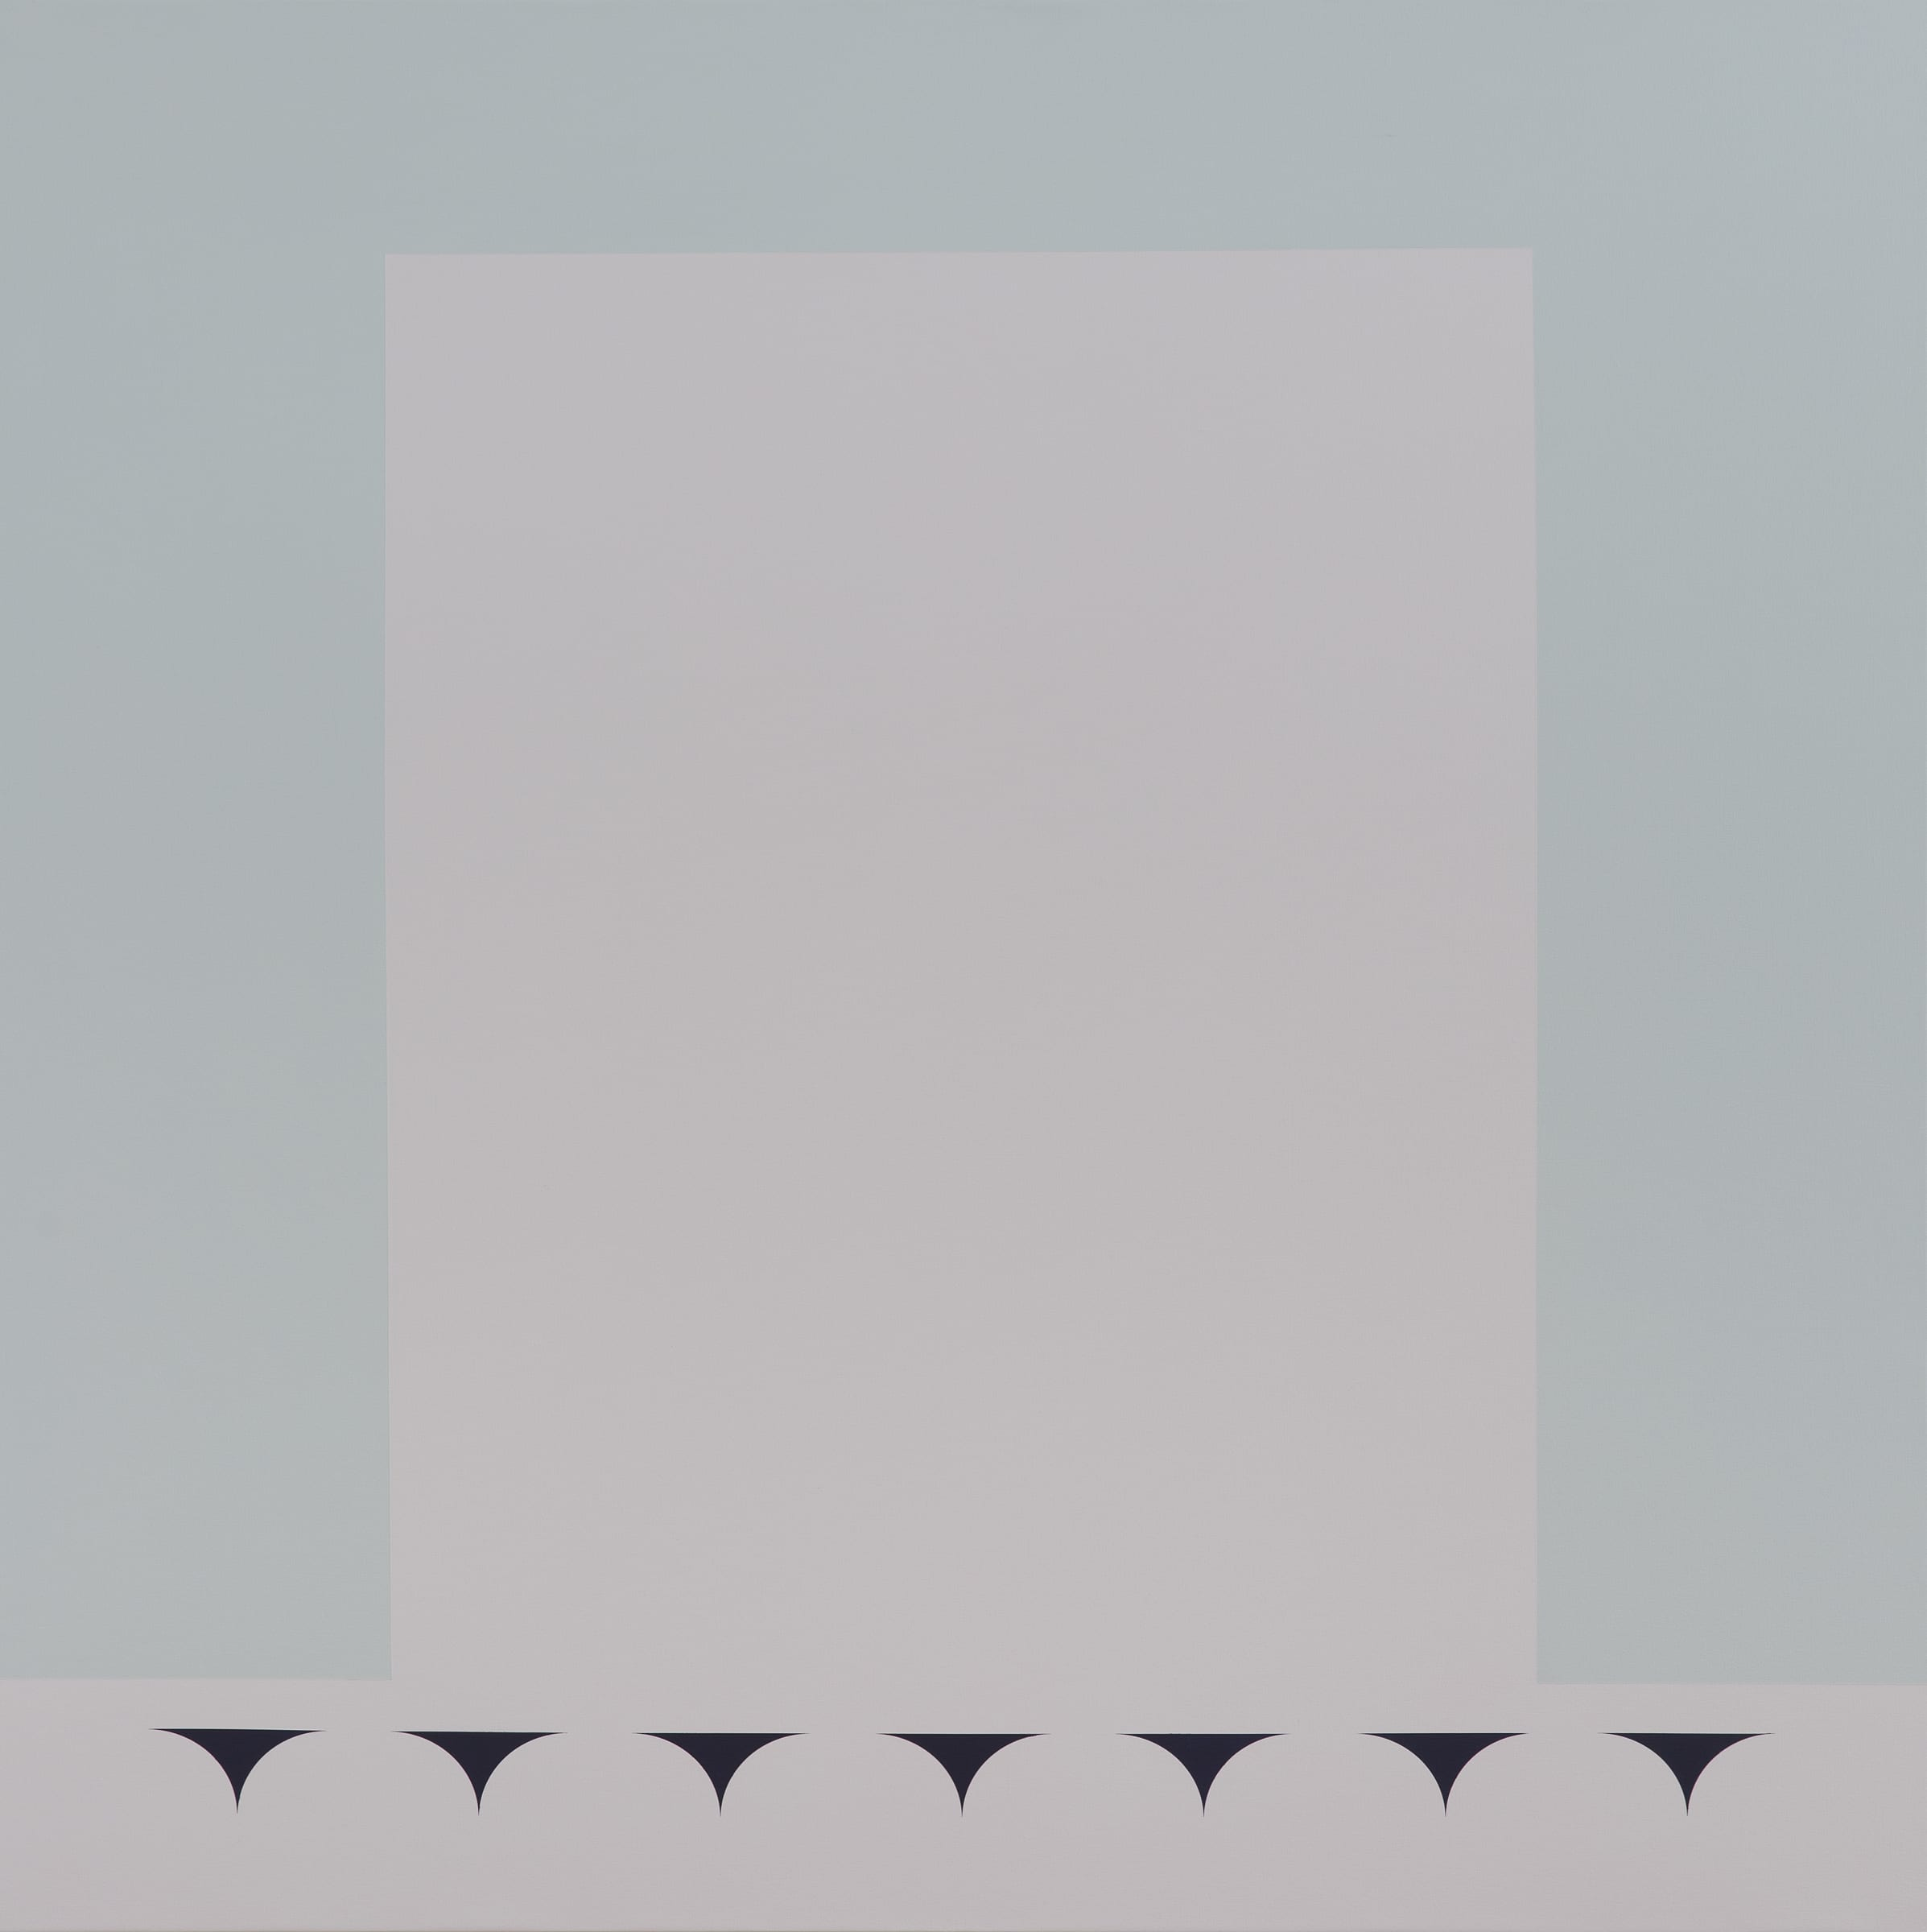 "<span class=""link fancybox-details-link""><a href=""/content/feature/11/artworks1529/"">View Detail Page</a></span><div class=""medium"">Acrylic on canvas</div> <div class=""dimensions"">142 x 142cm</div>"